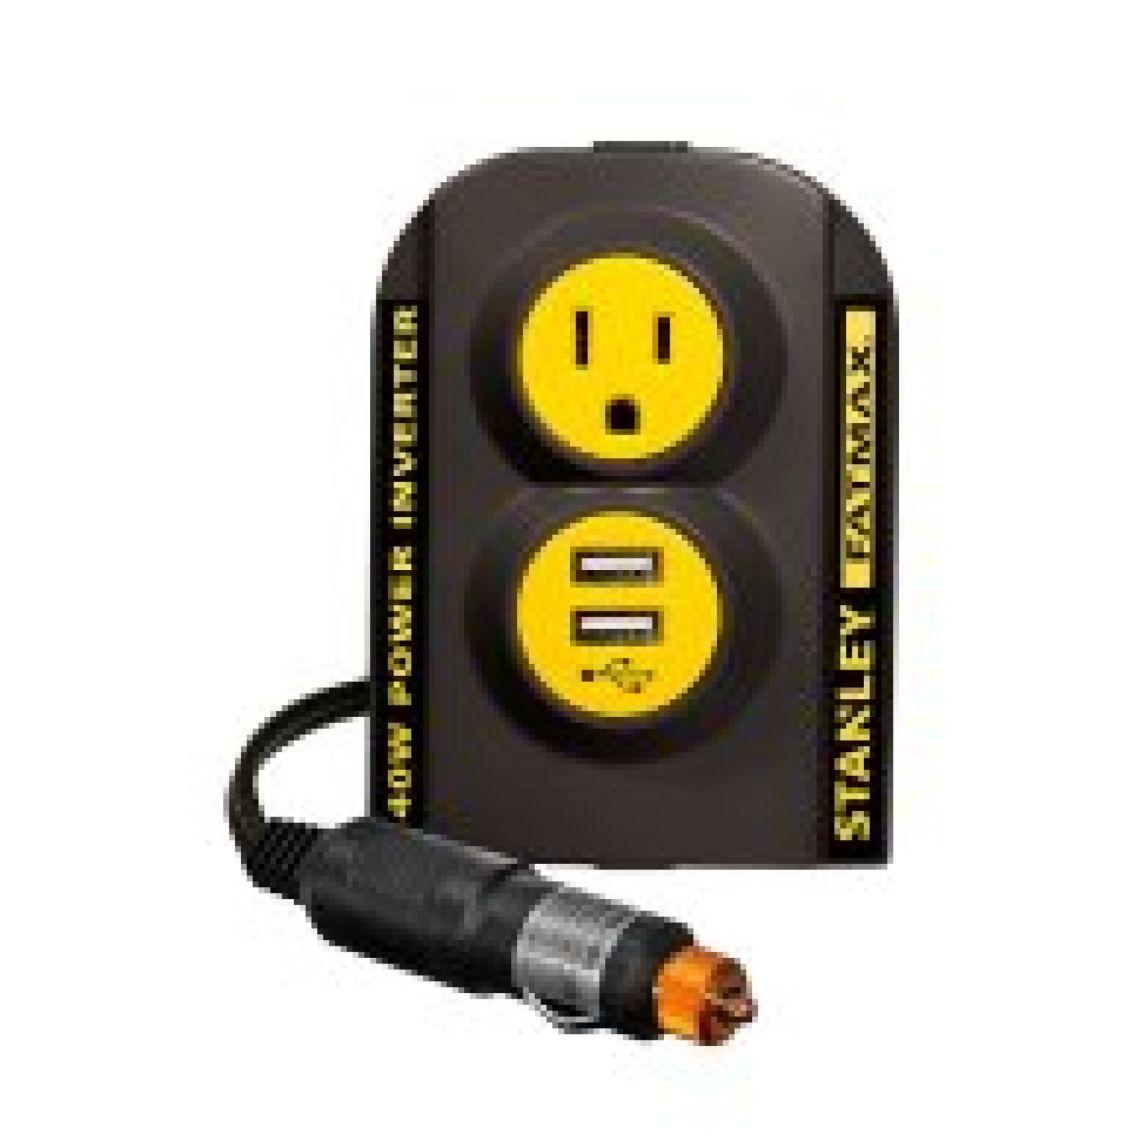 Stanley FatMax 140W Power Inverter with USB - Walmart.com